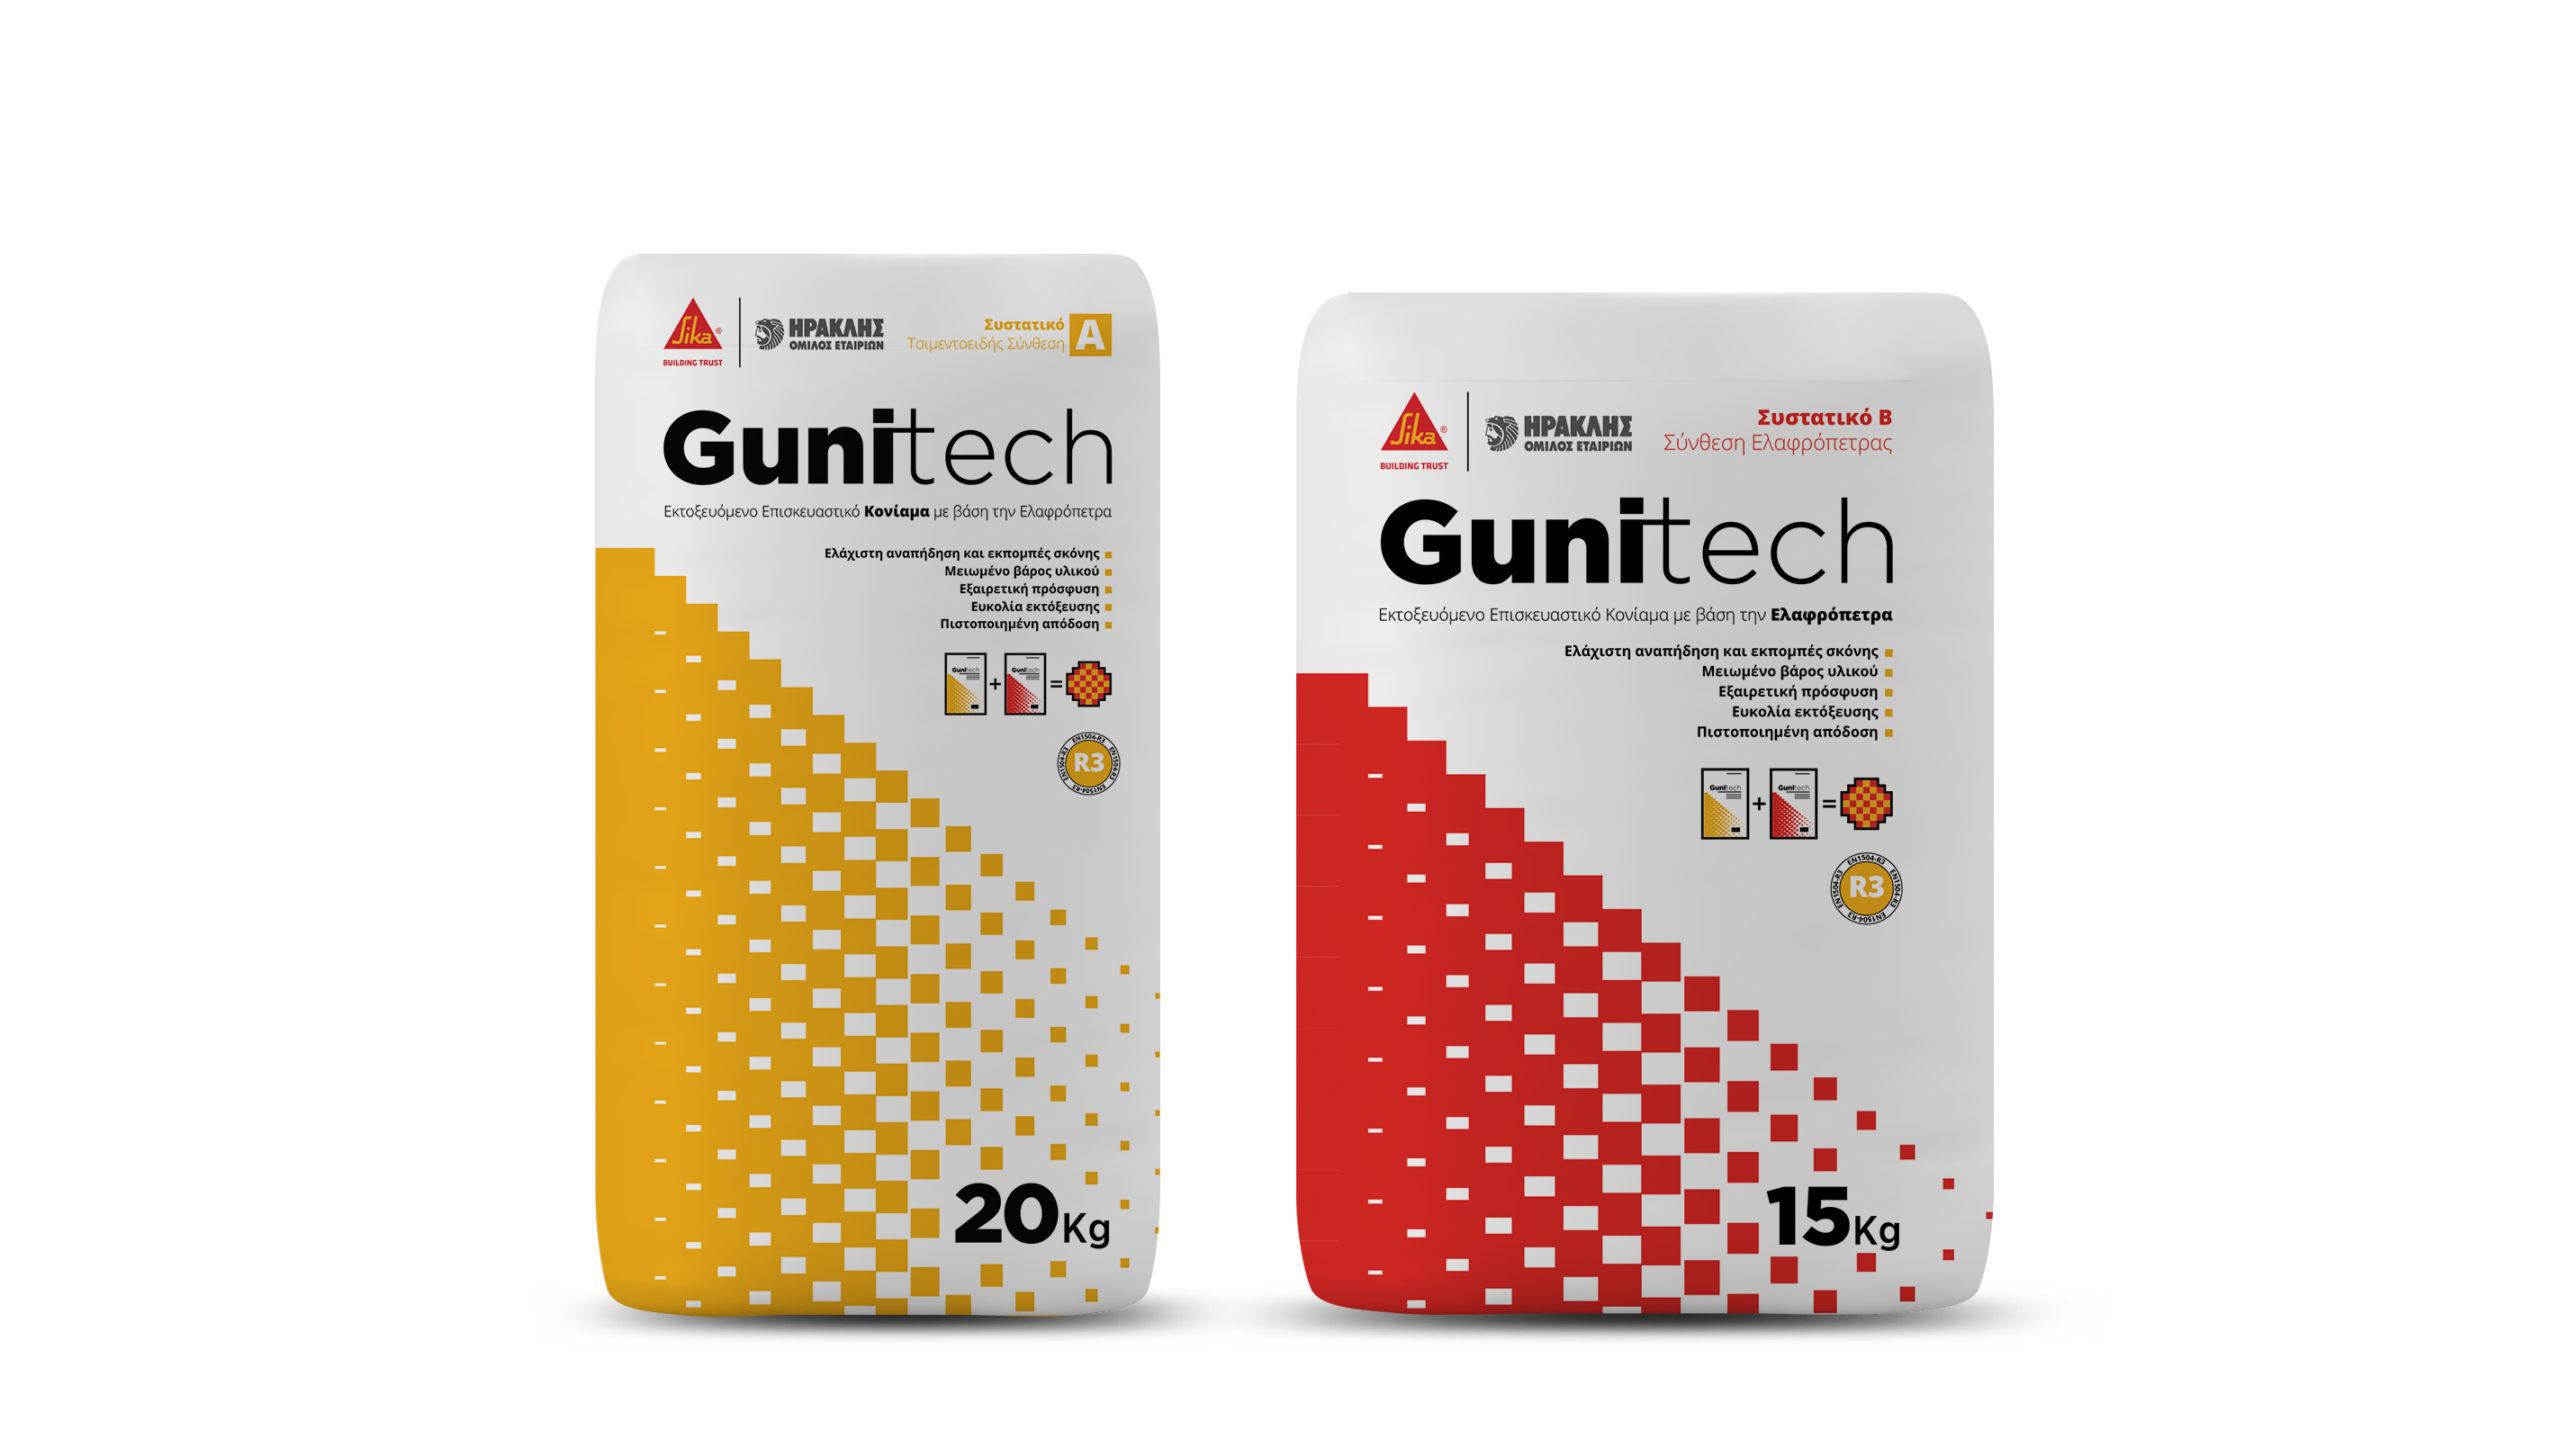 Gunitech Image